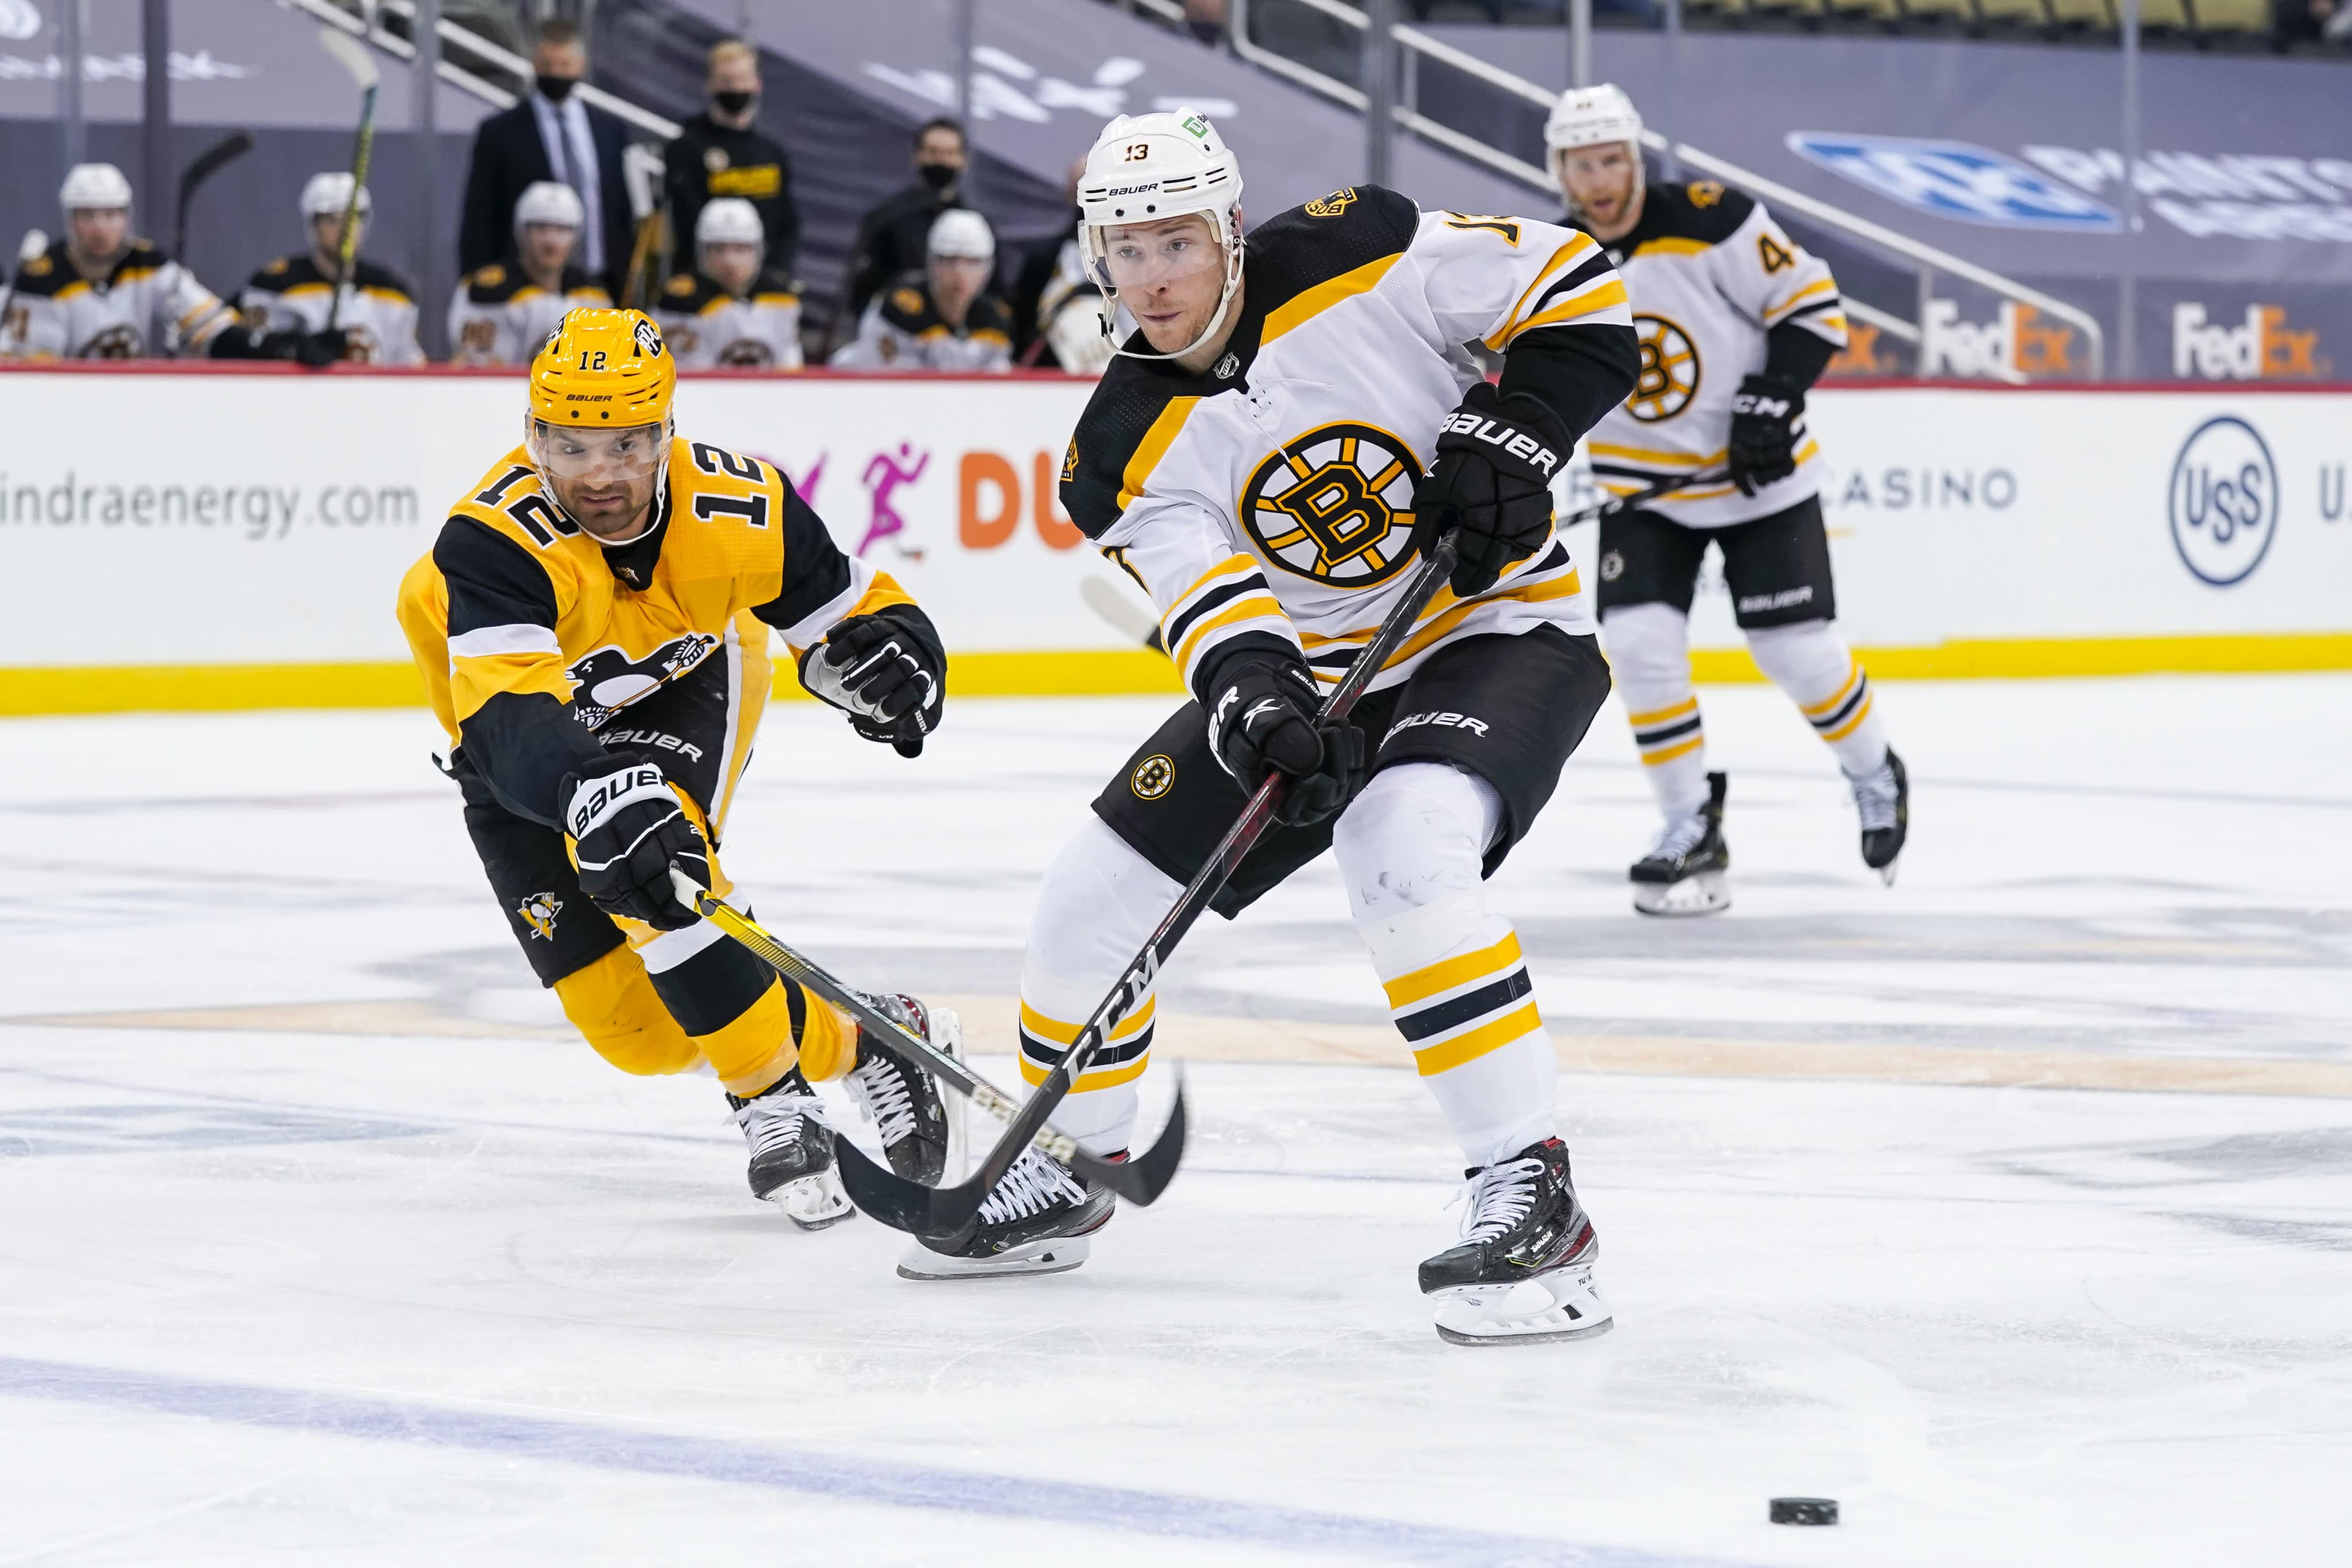 NHL moving to Turner Sports is $1 billion risk-reward for hockey